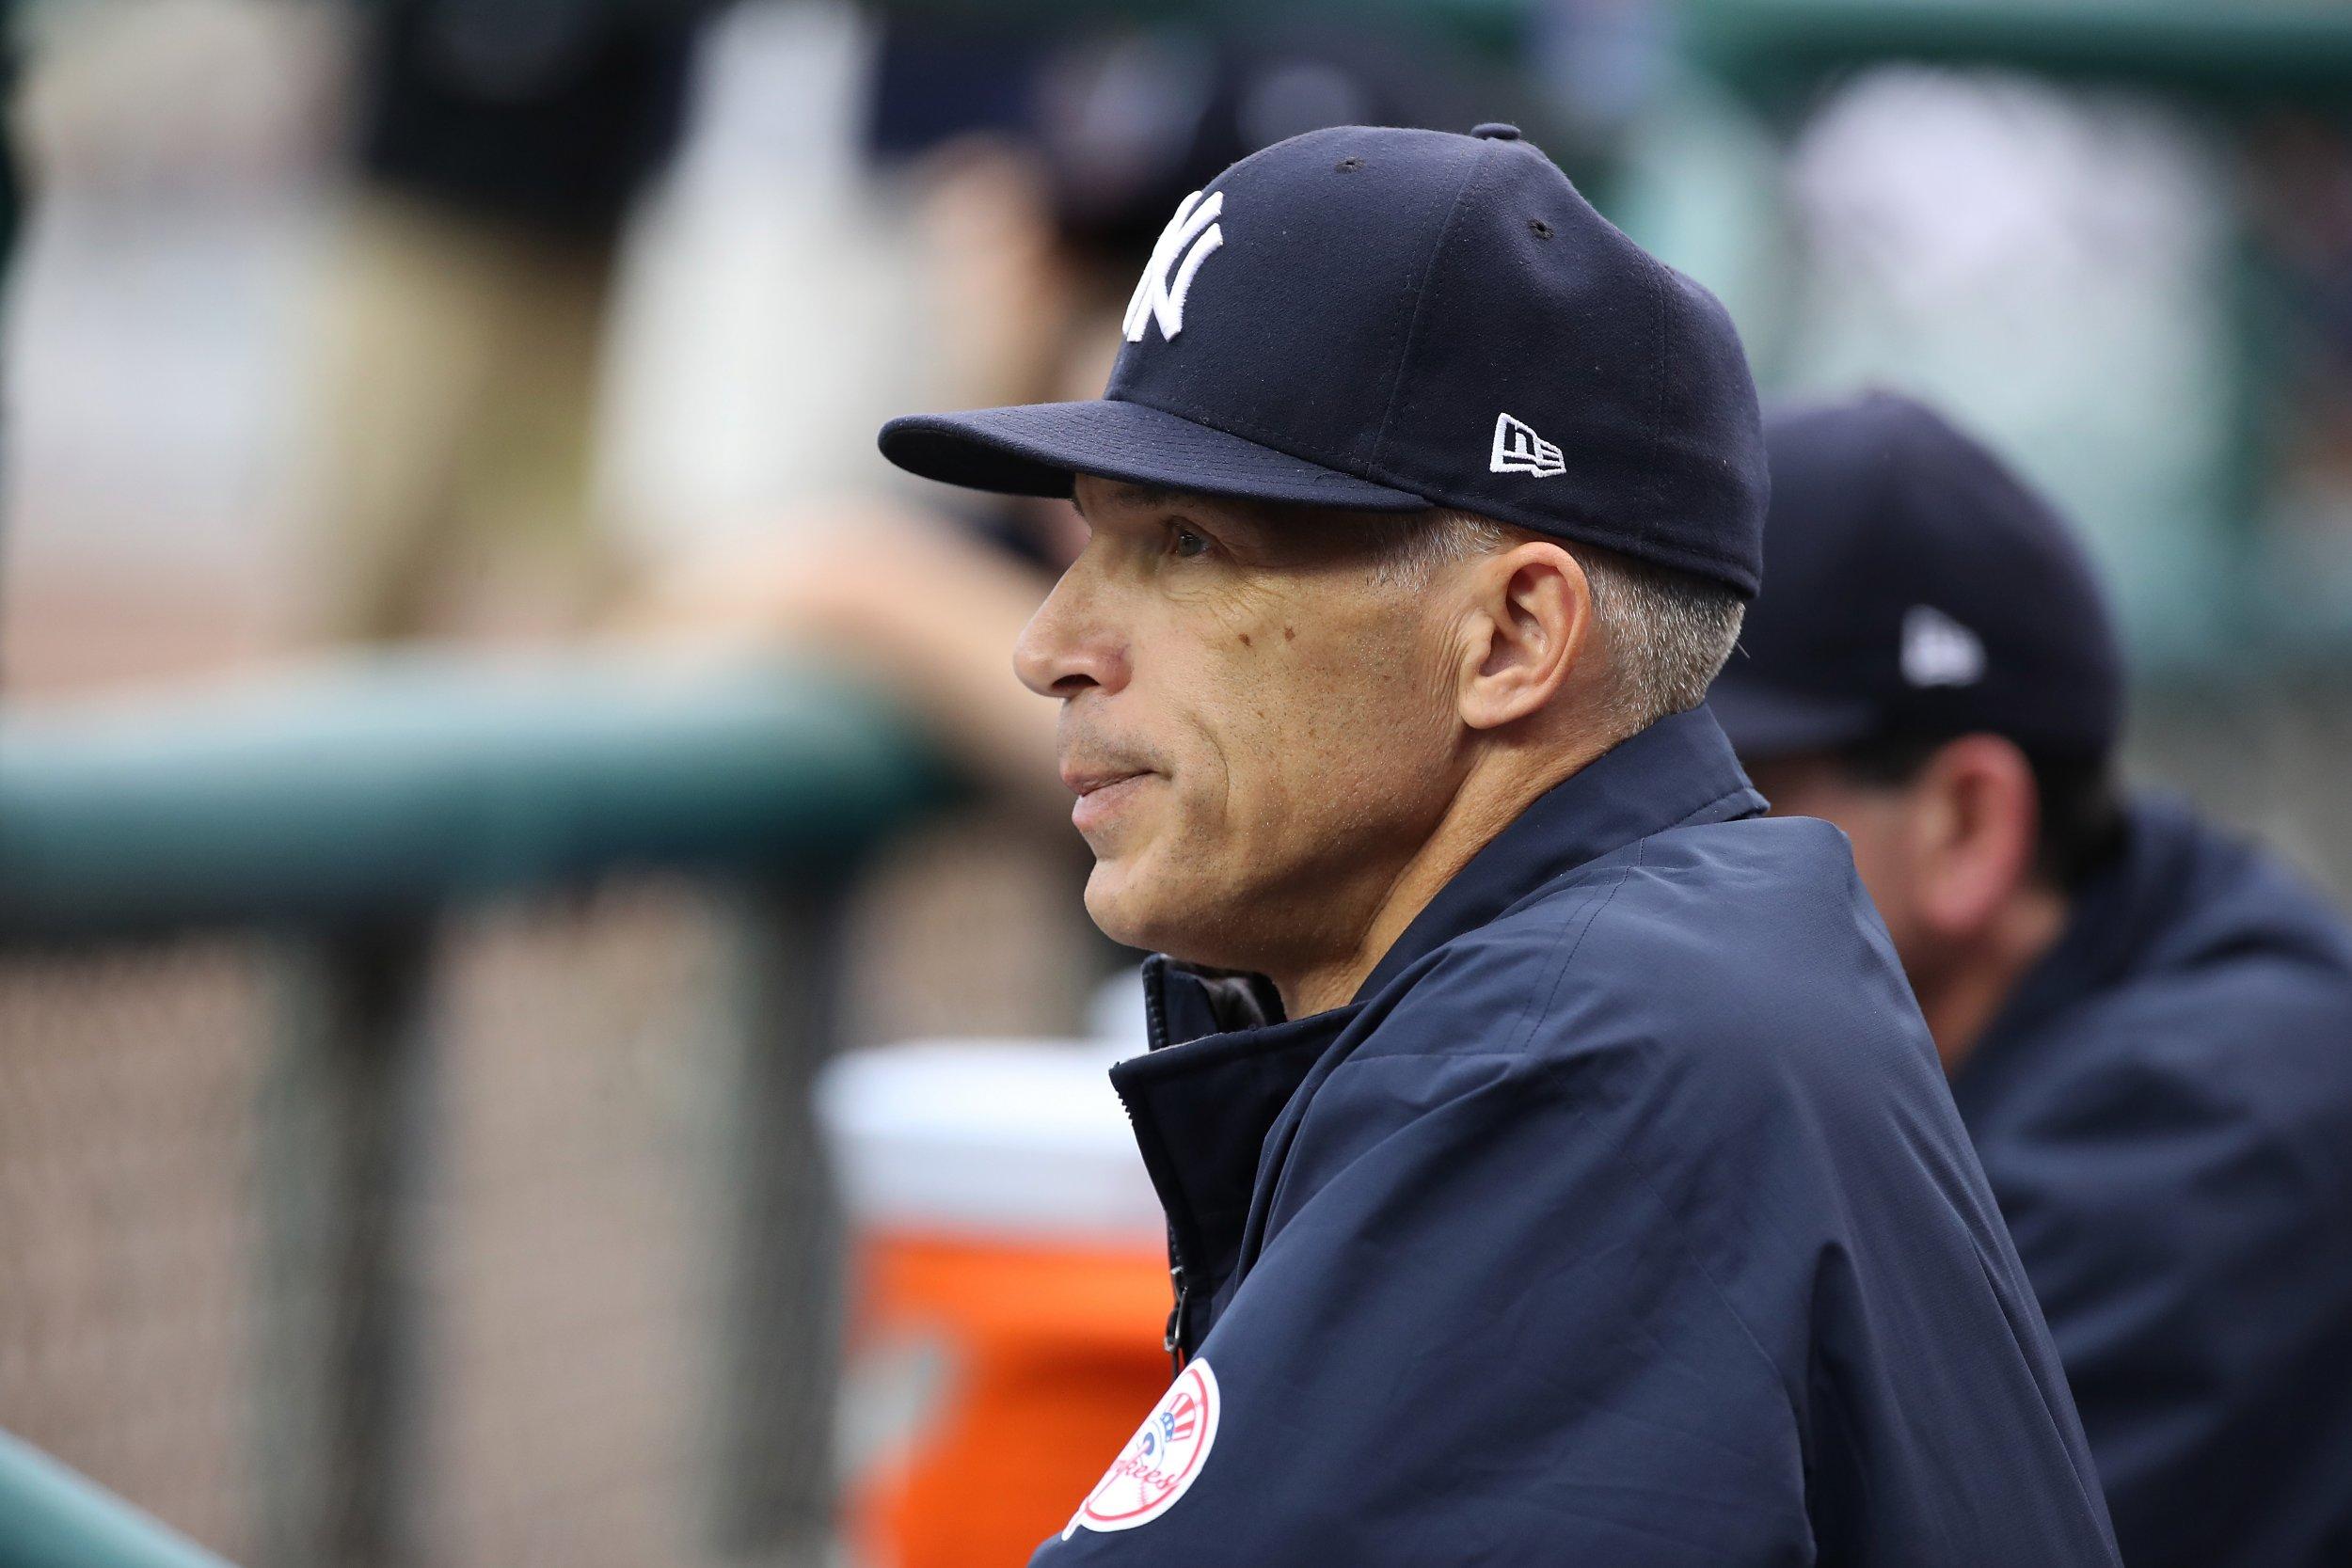 New York Yankees manager Joe Girardi.